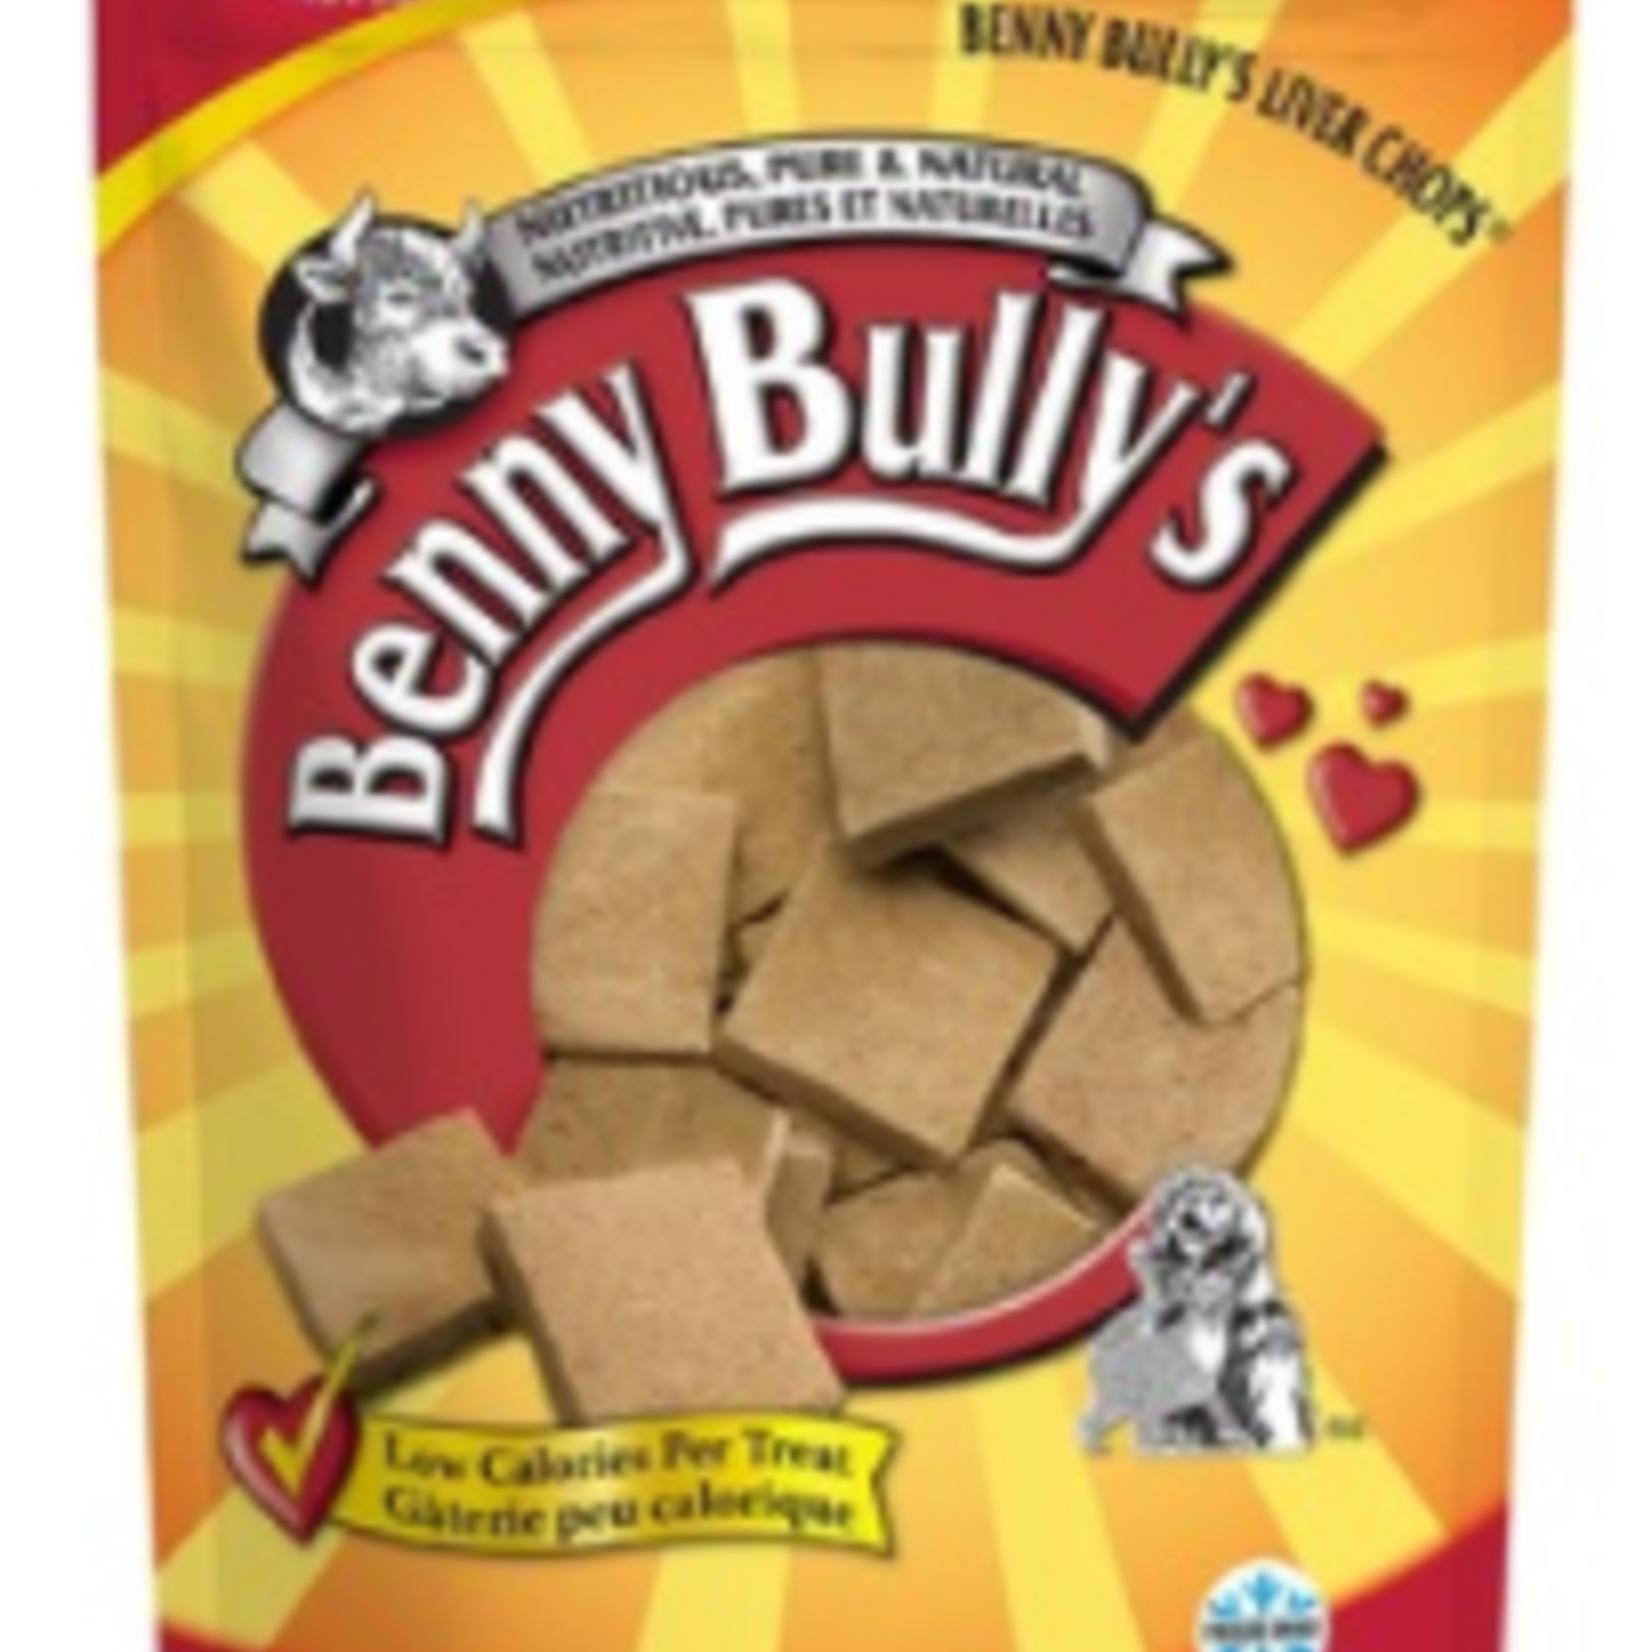 Benny Bully Benny Bully's Liver Chops Original (500g)